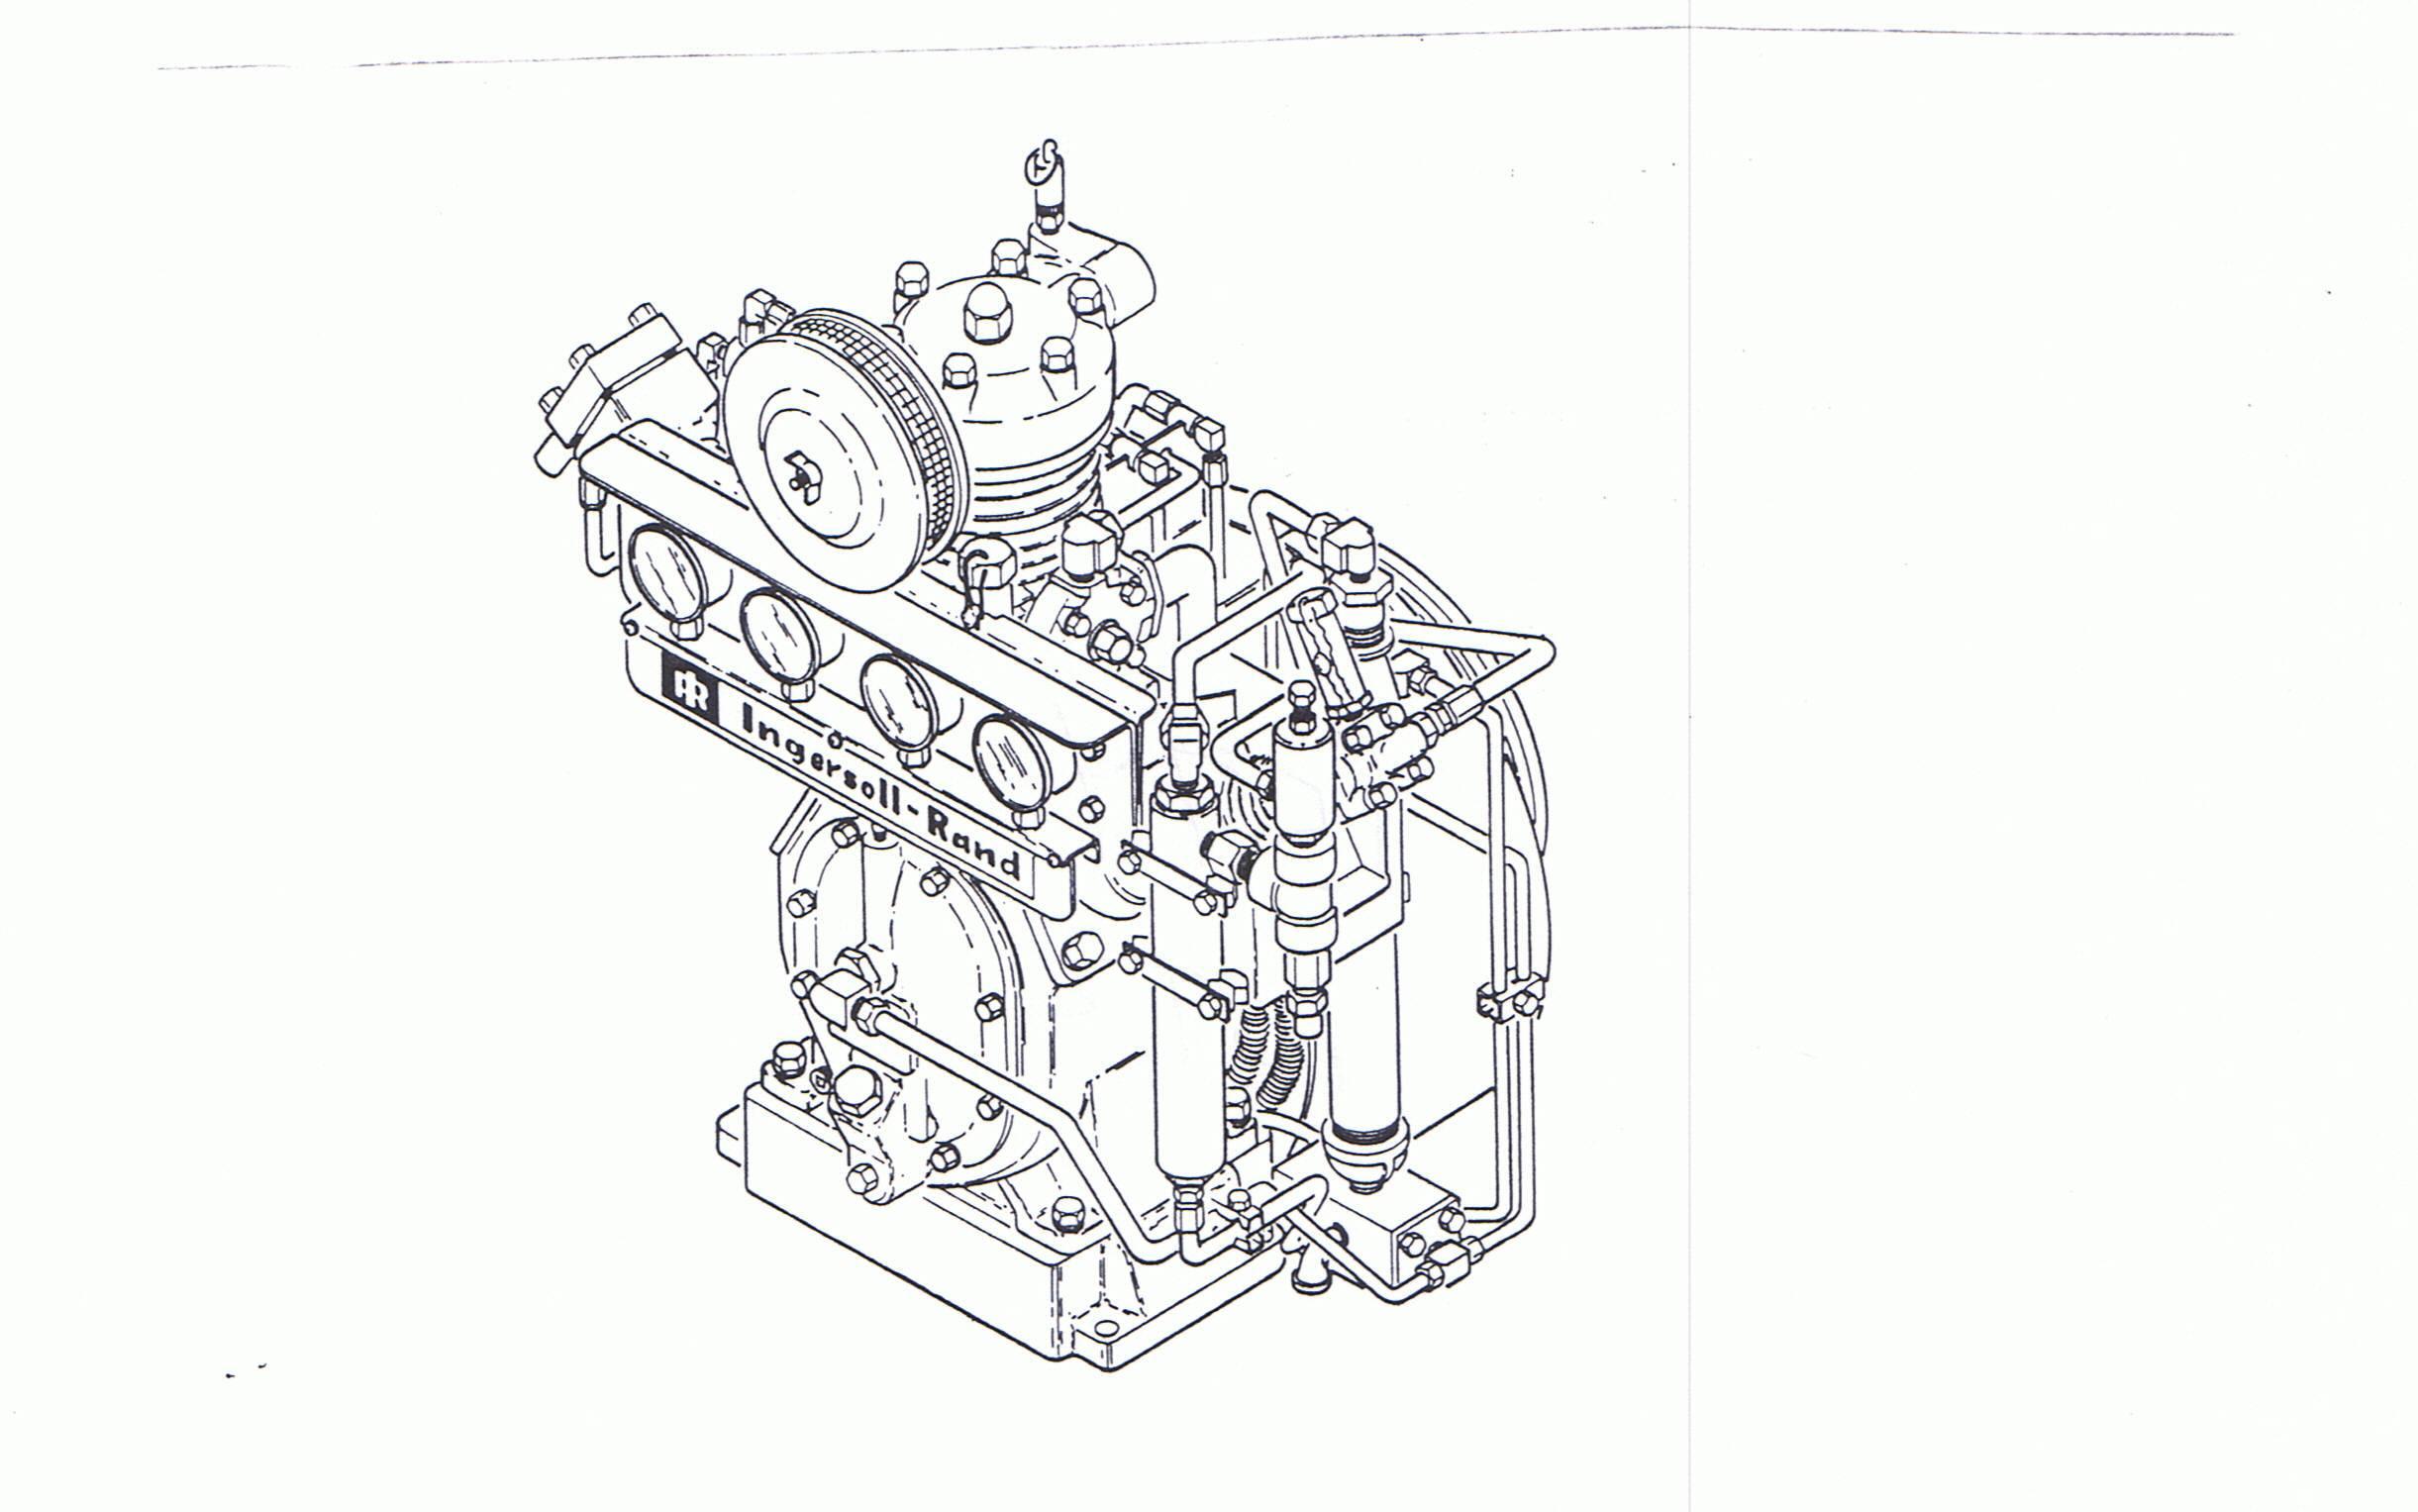 Buick Lucerne Air Compressor Wiring Diagram